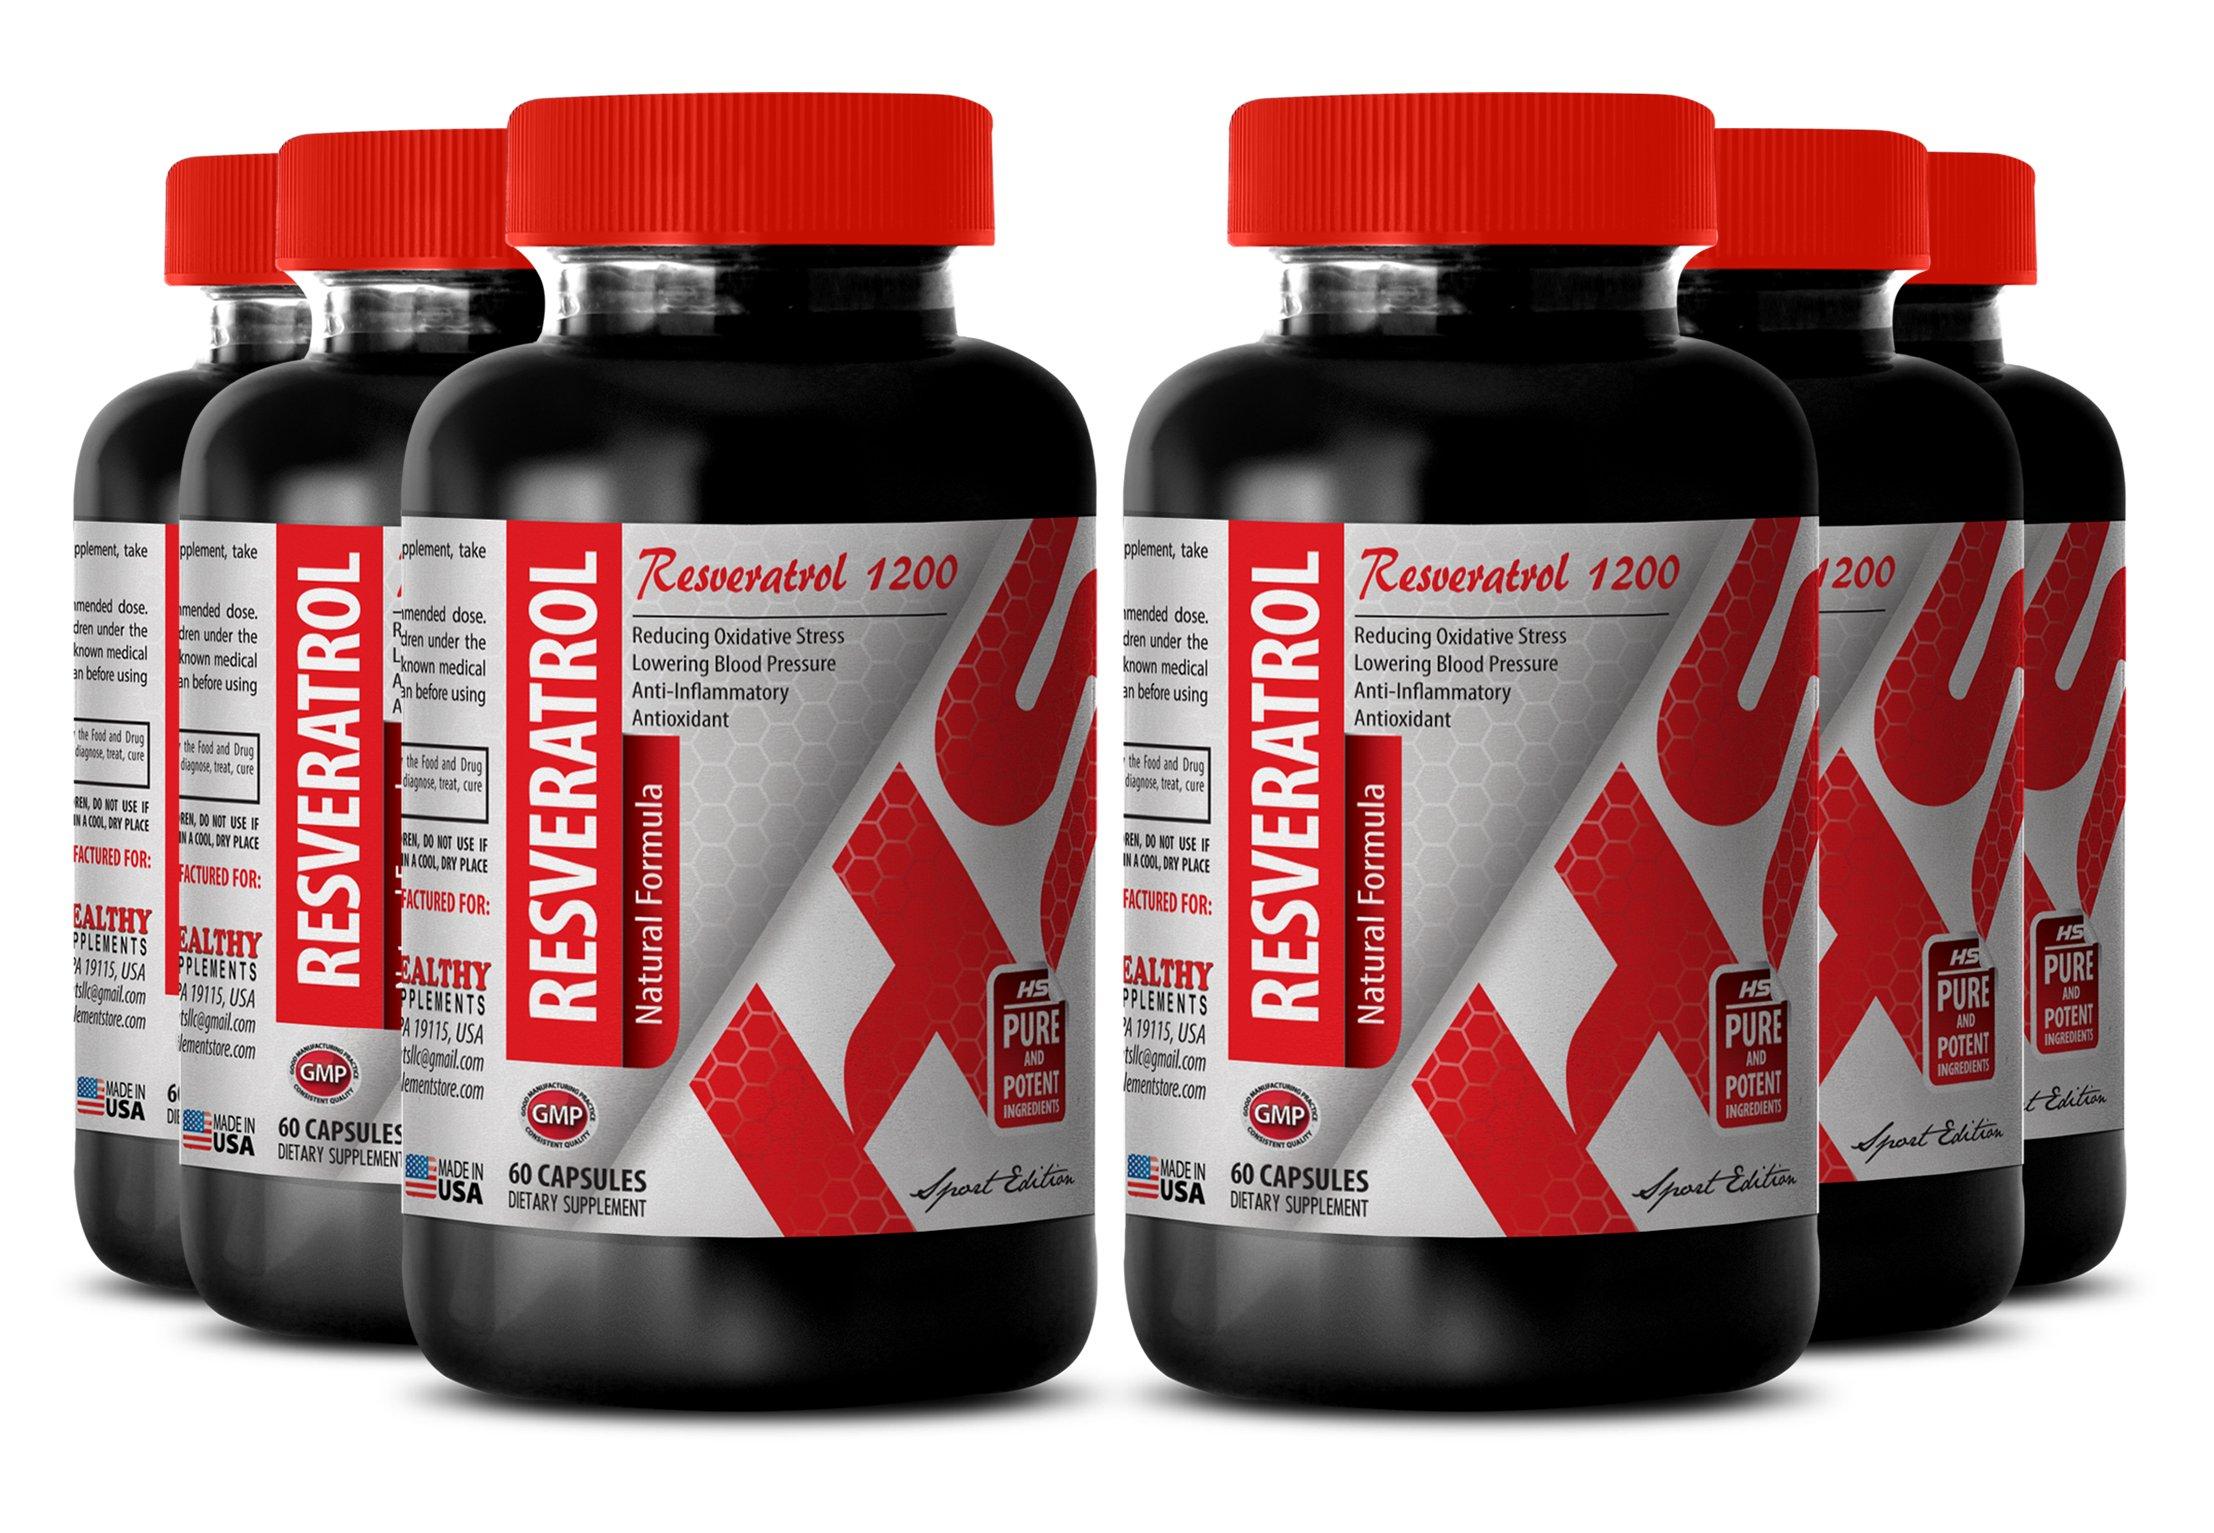 Resveratrol 1200mg - RESVERATROL RED WINE EXTRACT 1200 MG - improve energy levels (6 Bottles)